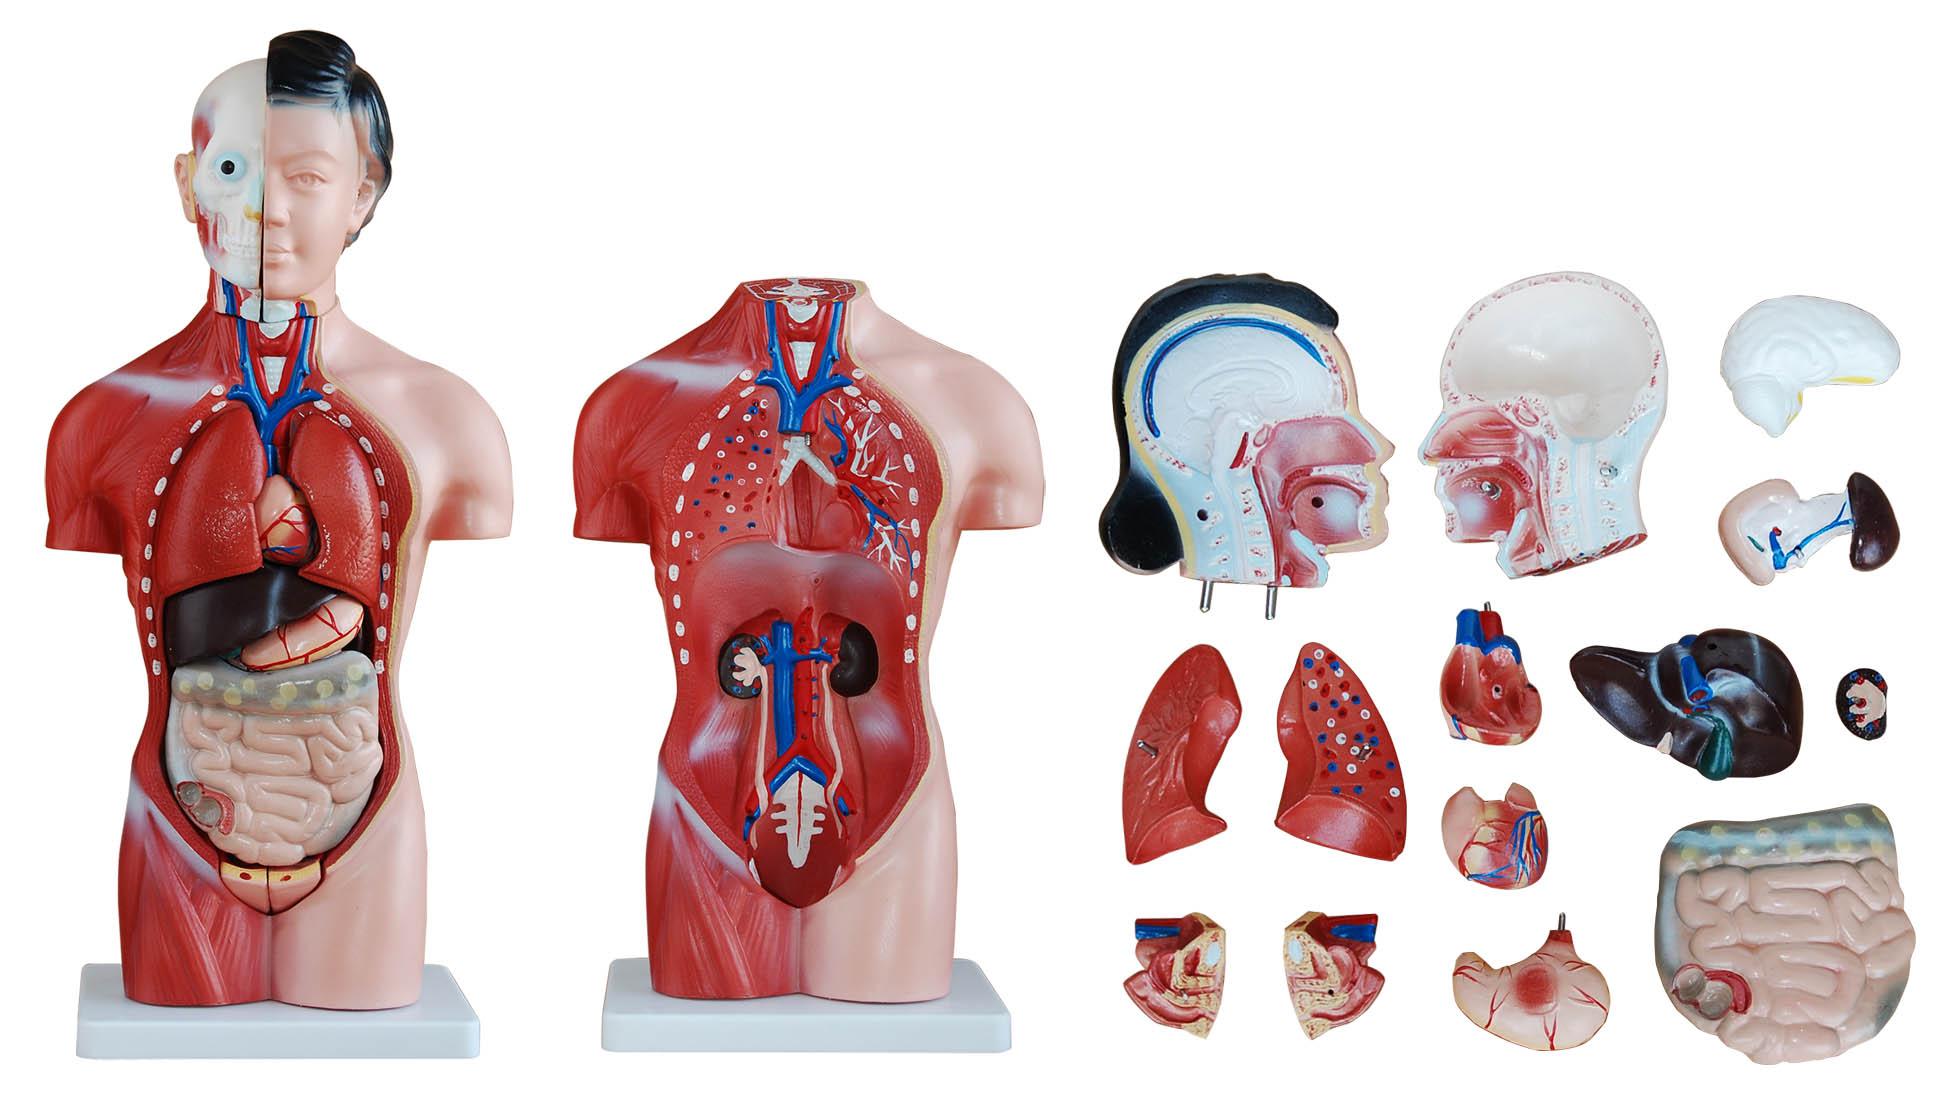 42cm Tall Human Anatomical Female Torso Model | Torso Models – Store ...